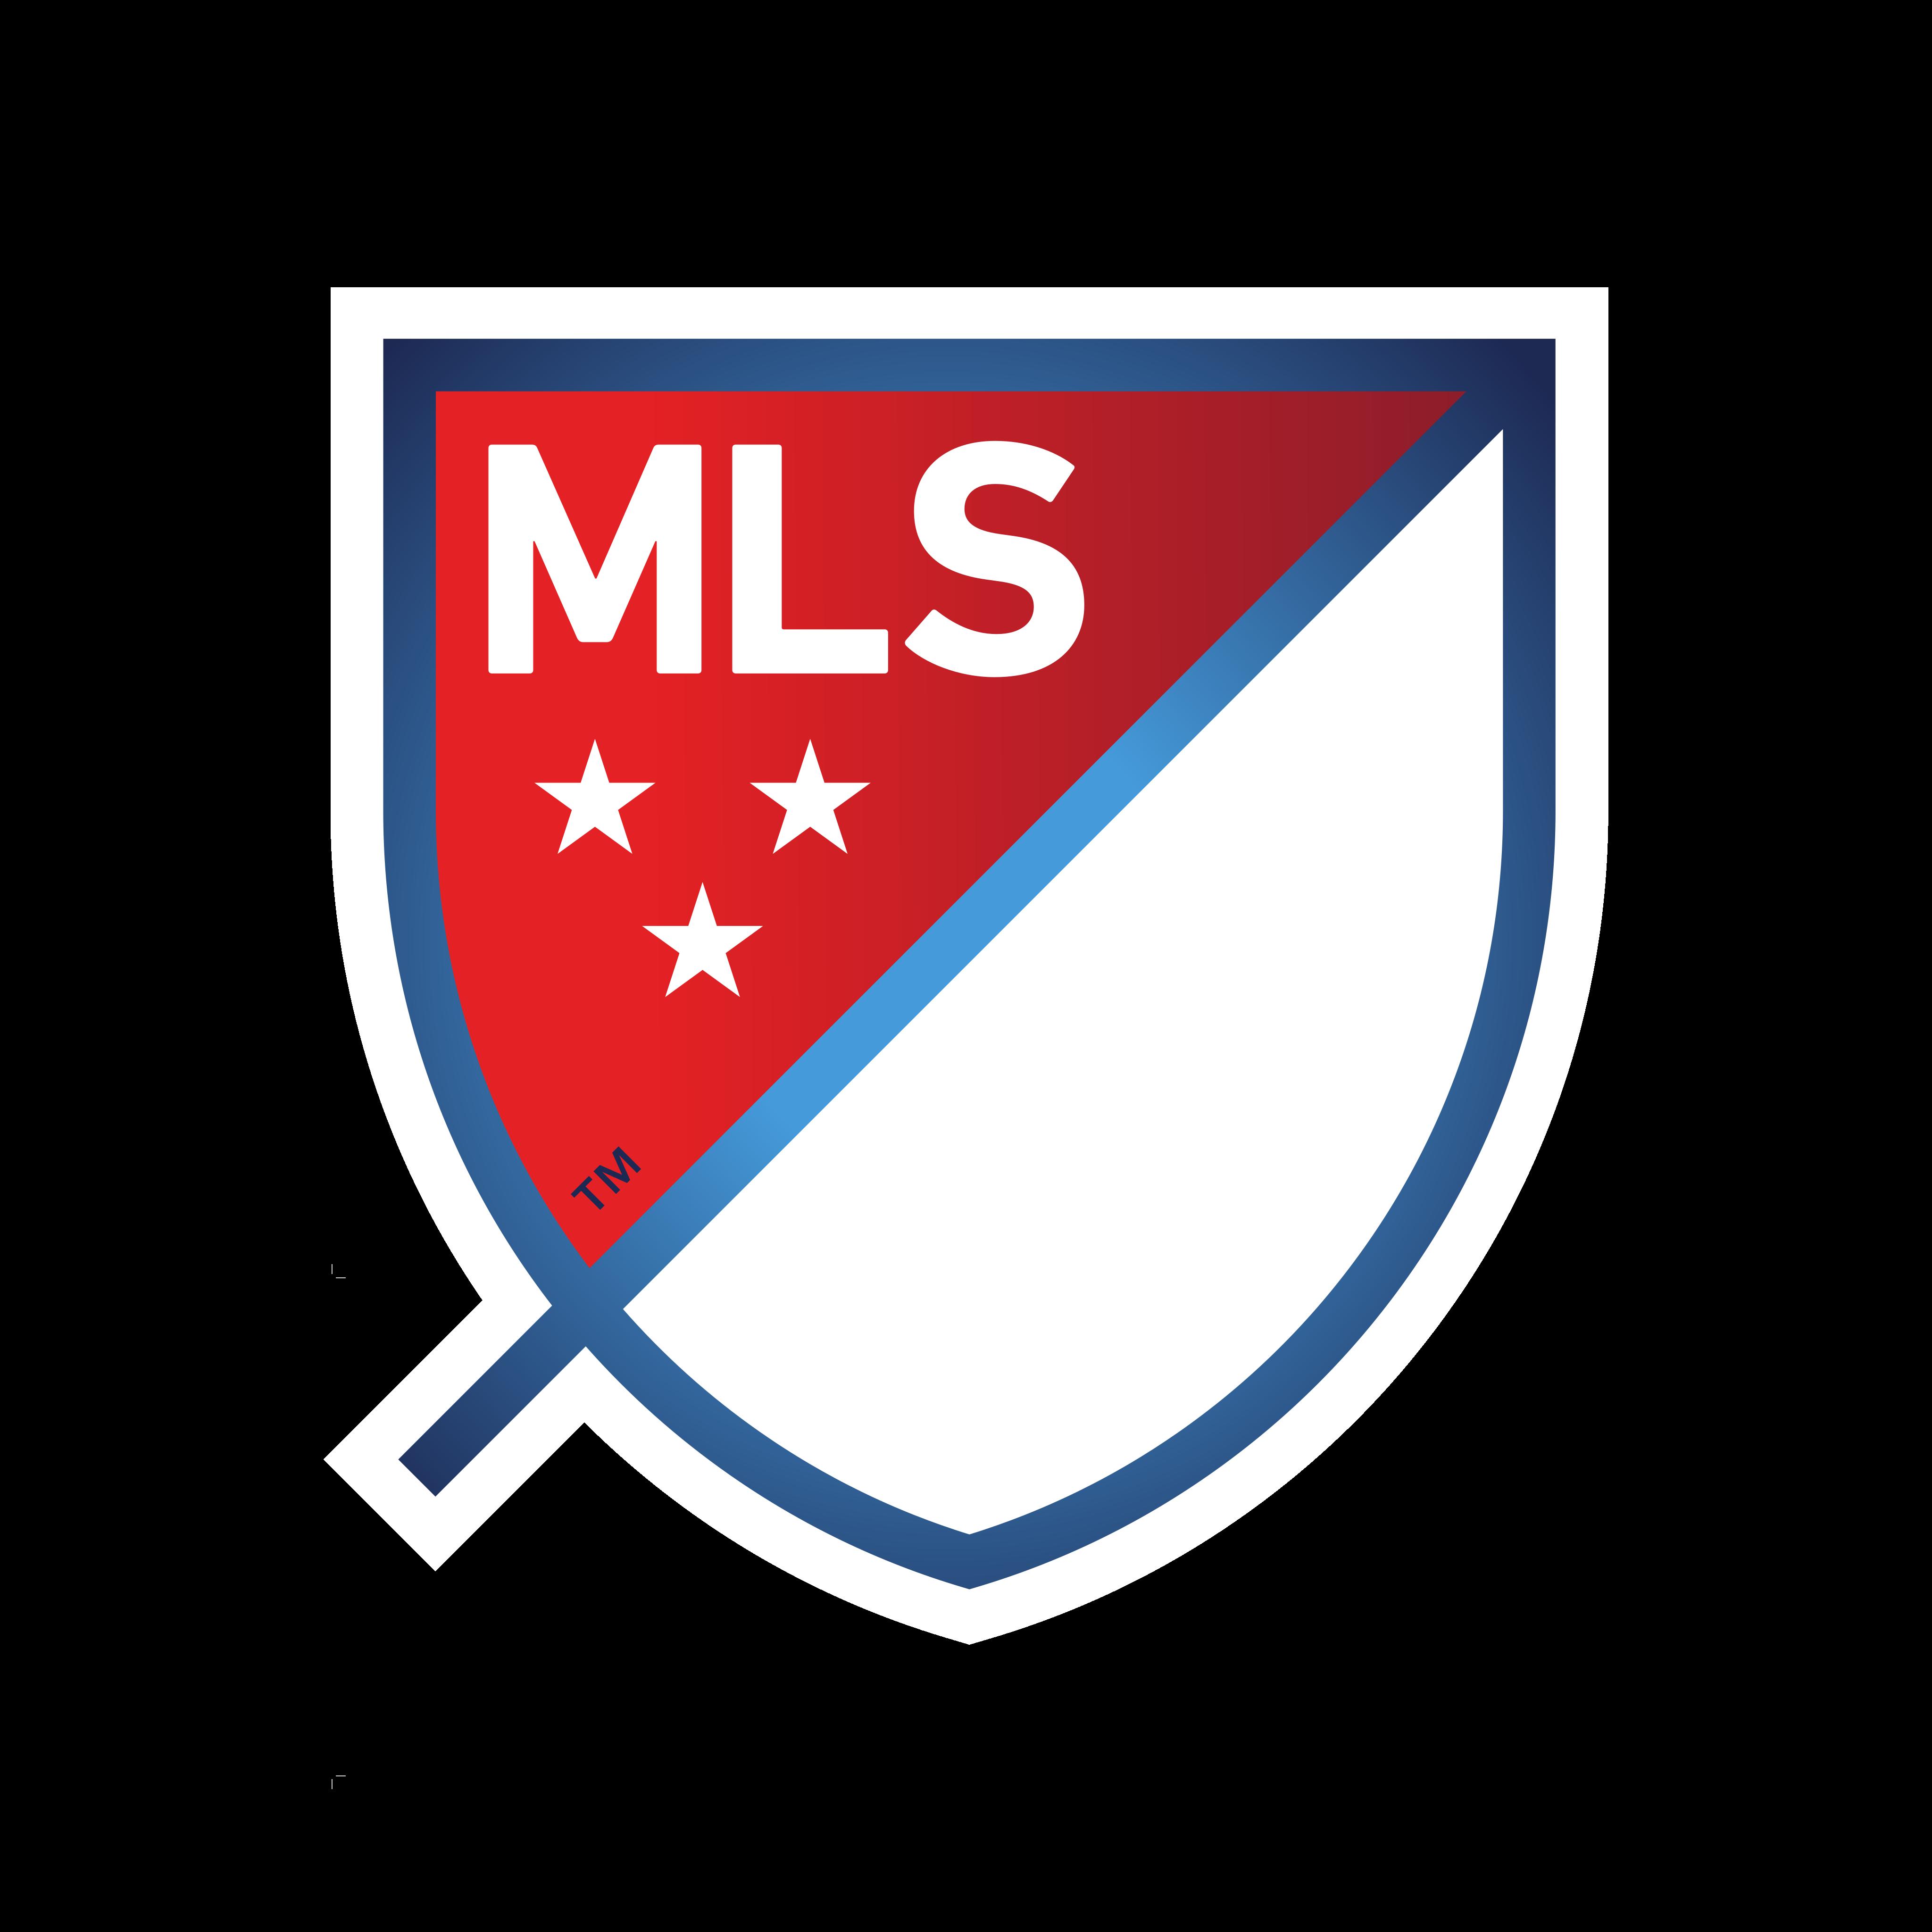 mls logo 0 - MLS Logo - Major League Soccer Logo